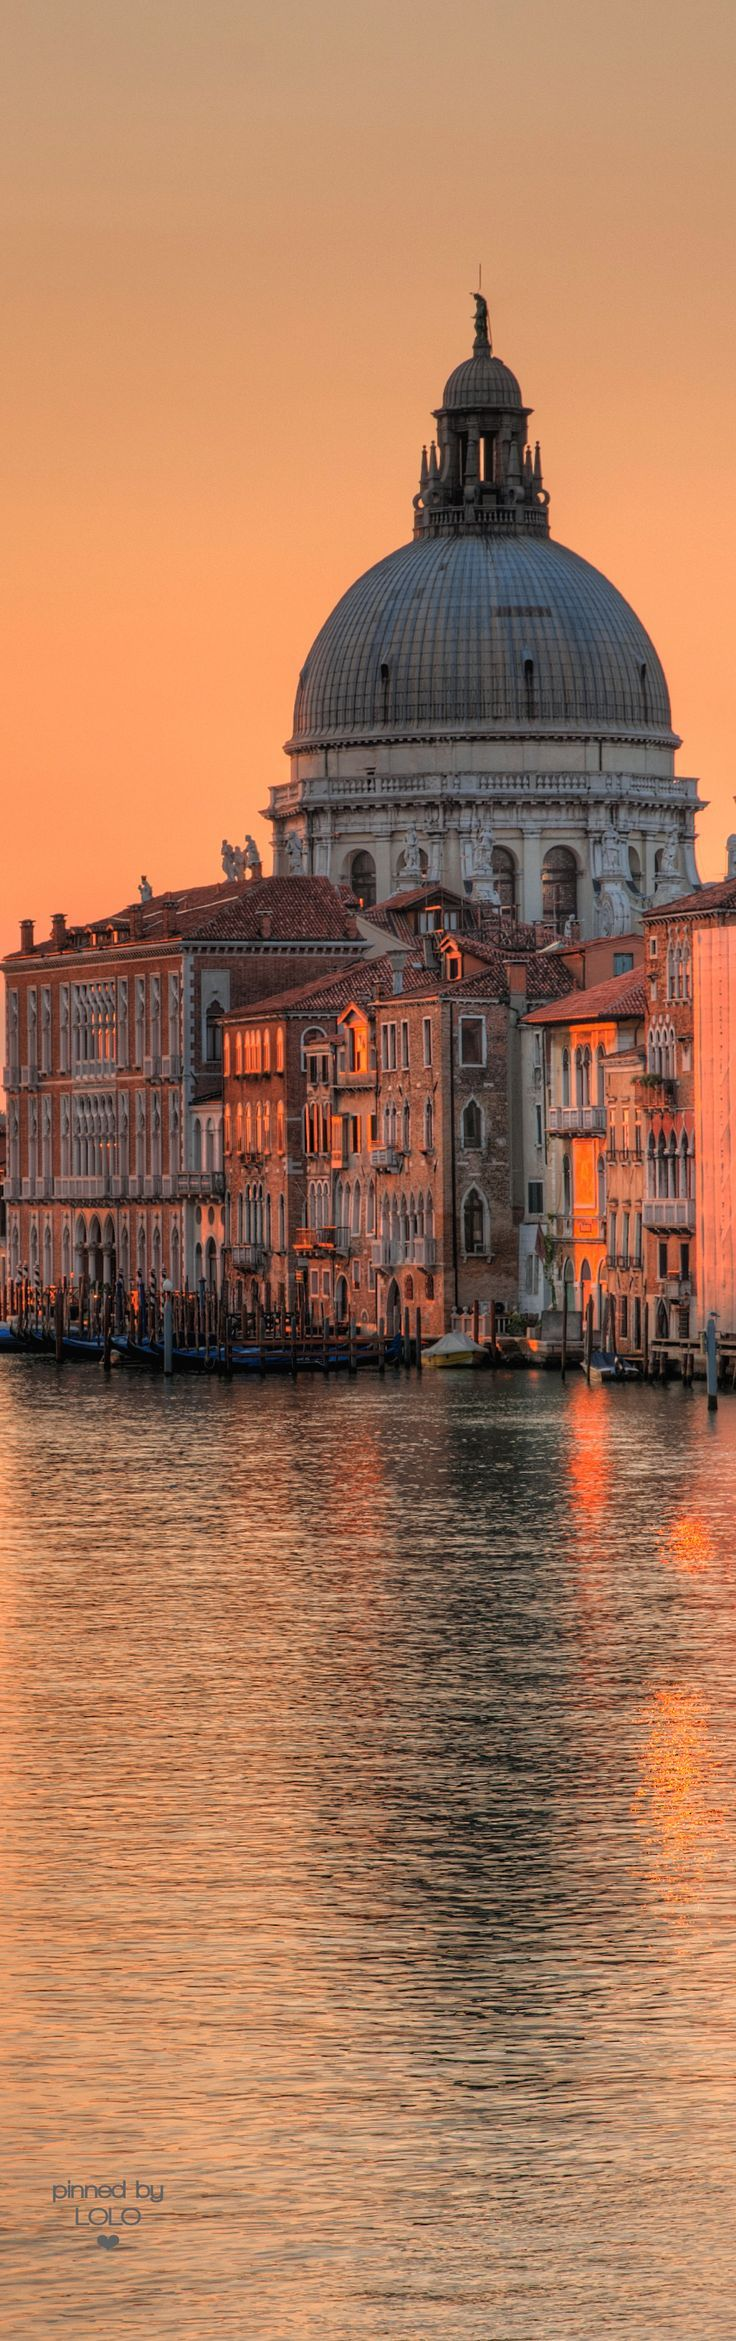 Sunrise at the Grand Canal and the Church of Santa Maria della Salute - Venice, Italy #travel